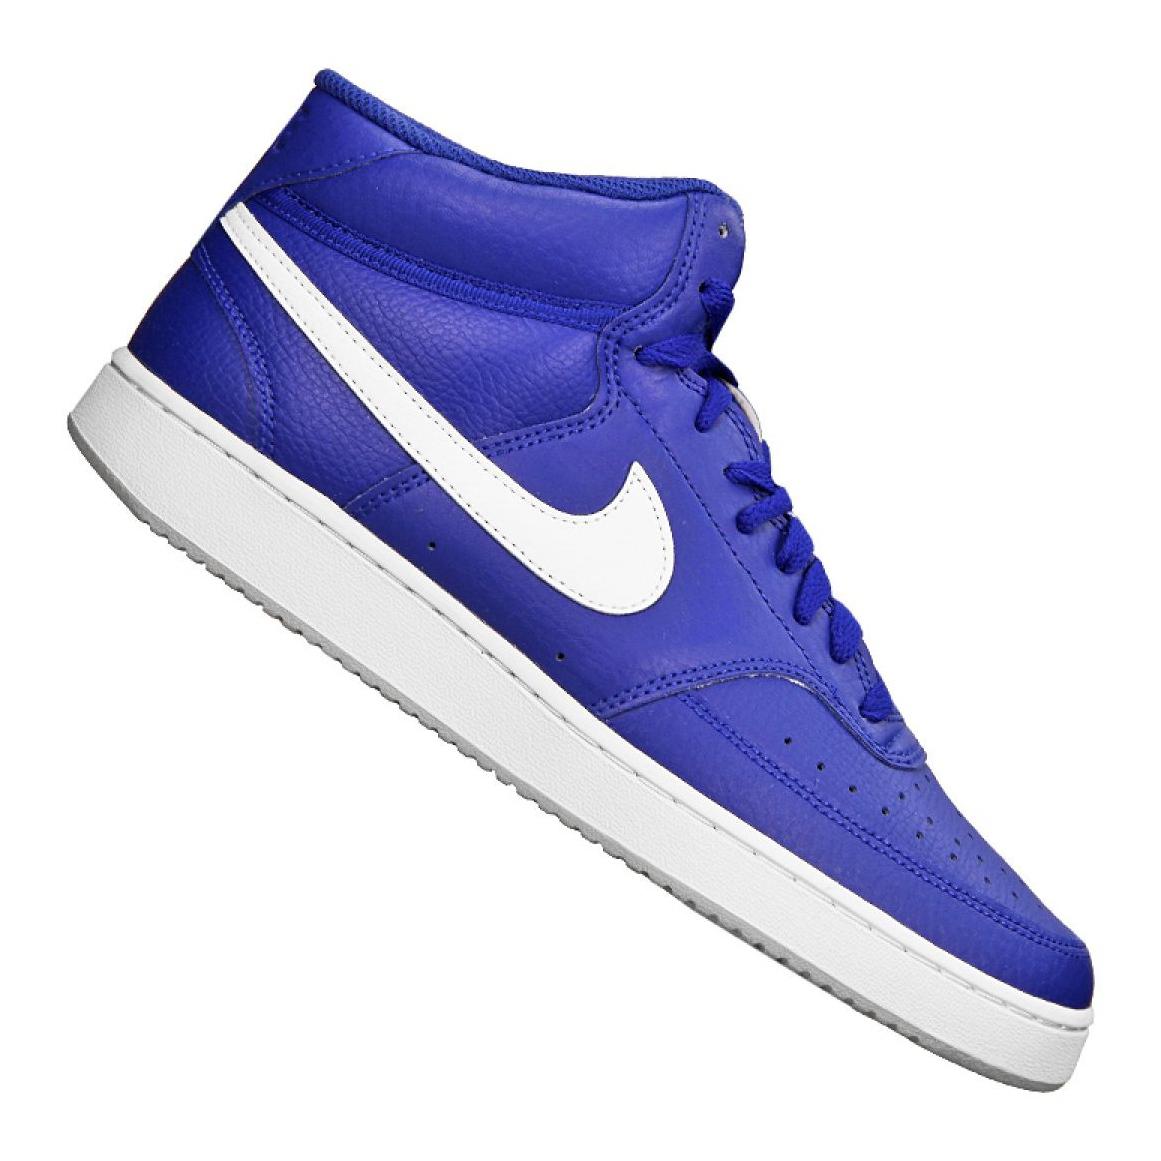 Sapatilhas Nike Court Vision Mid M CD5466 400 azul